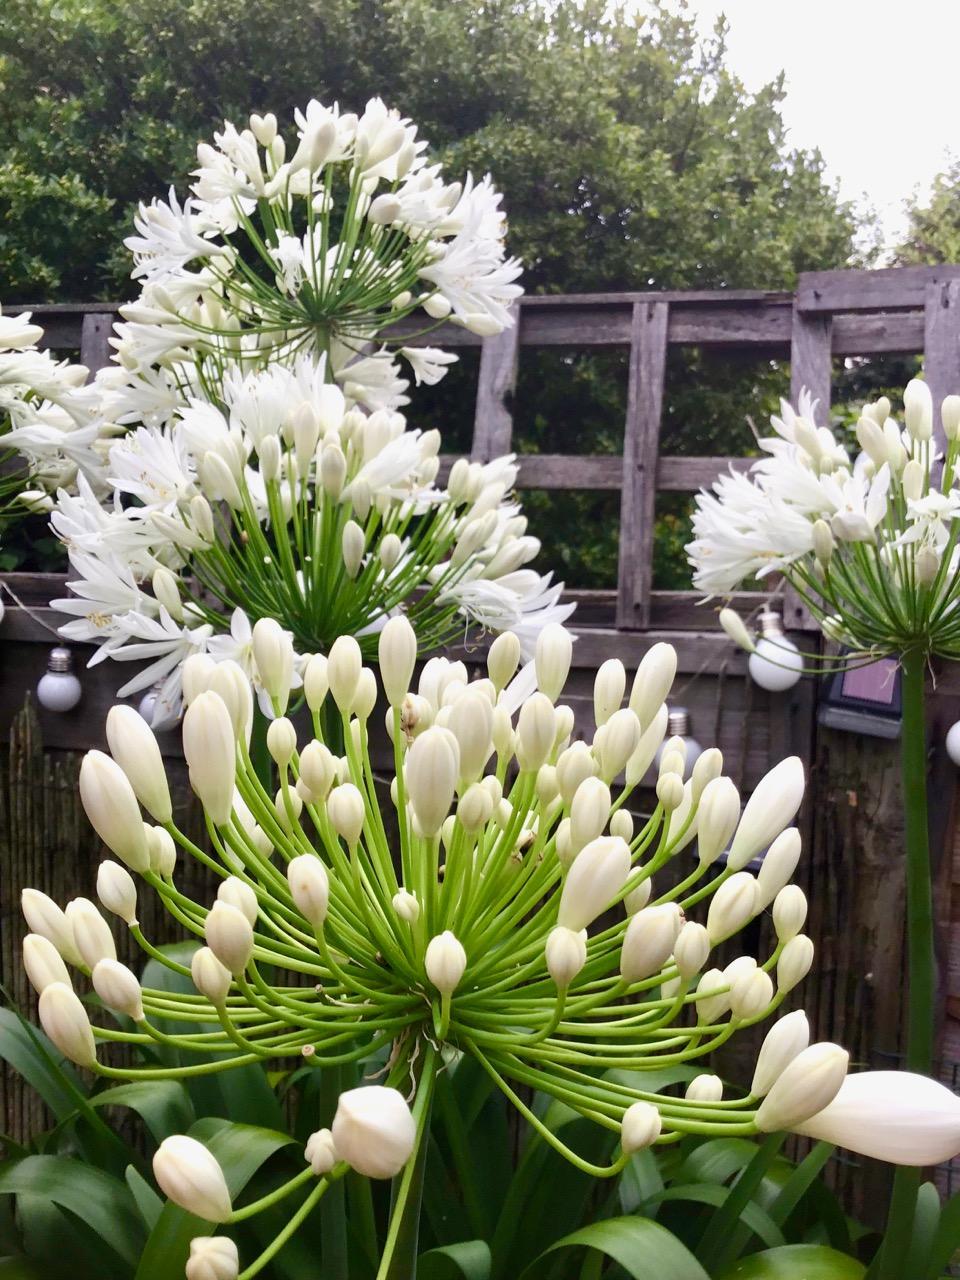 agapanthus in flower